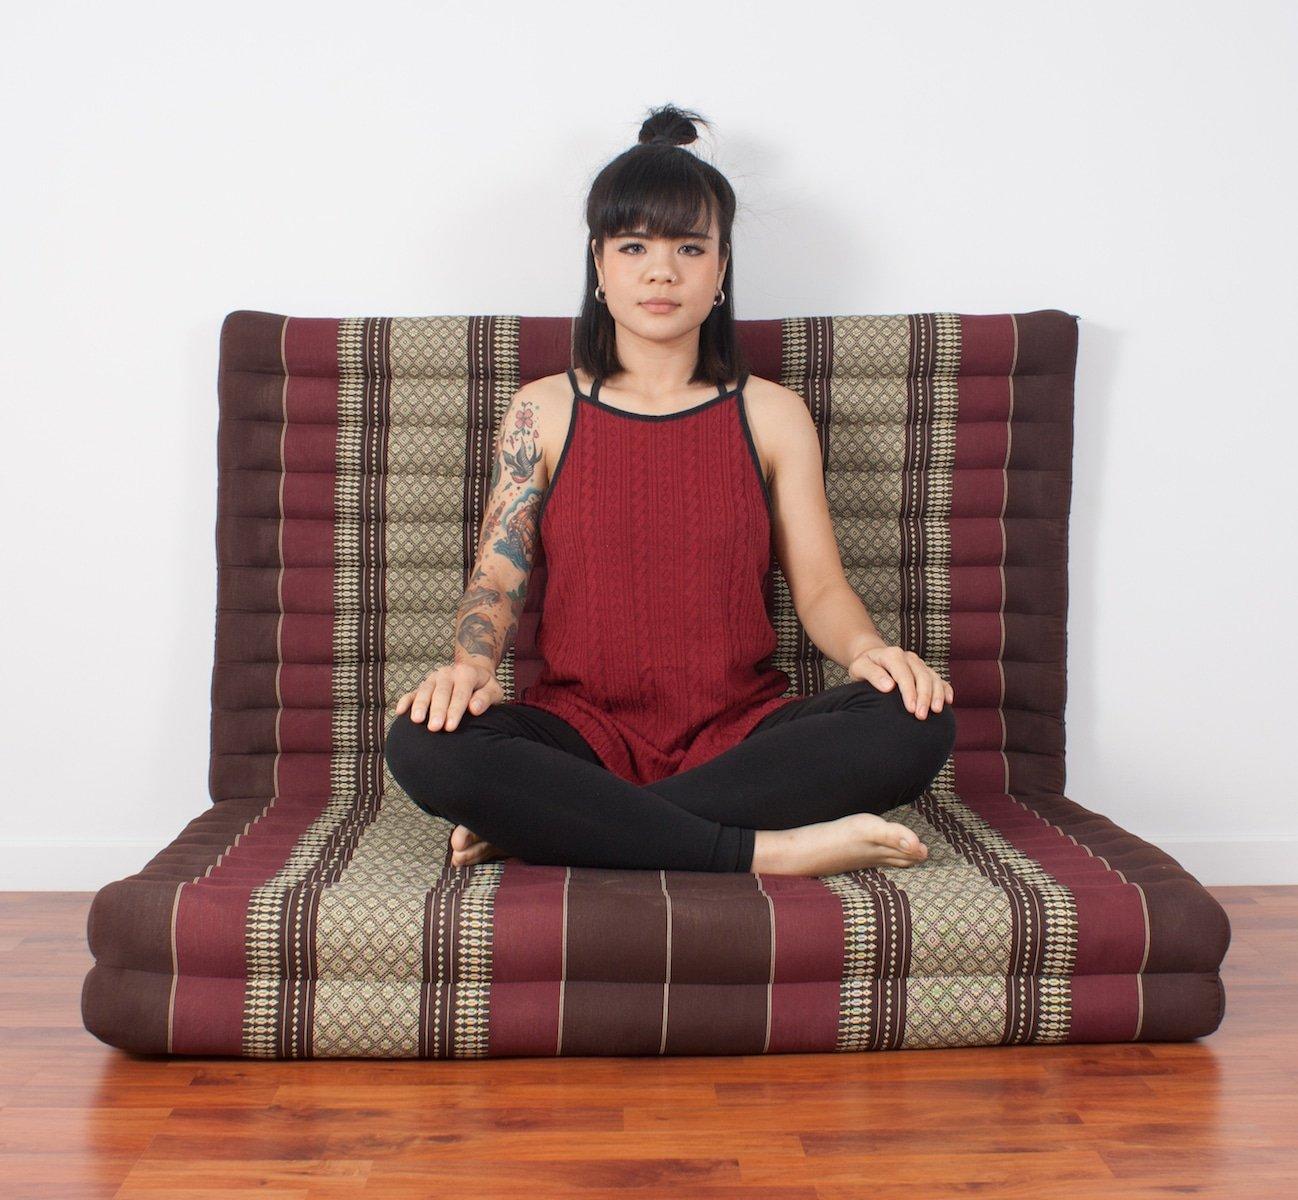 Leewadee Thai Massage Mat XL, 82x46x3 inches, Kapok, brown red by Leewadee (Image #5)